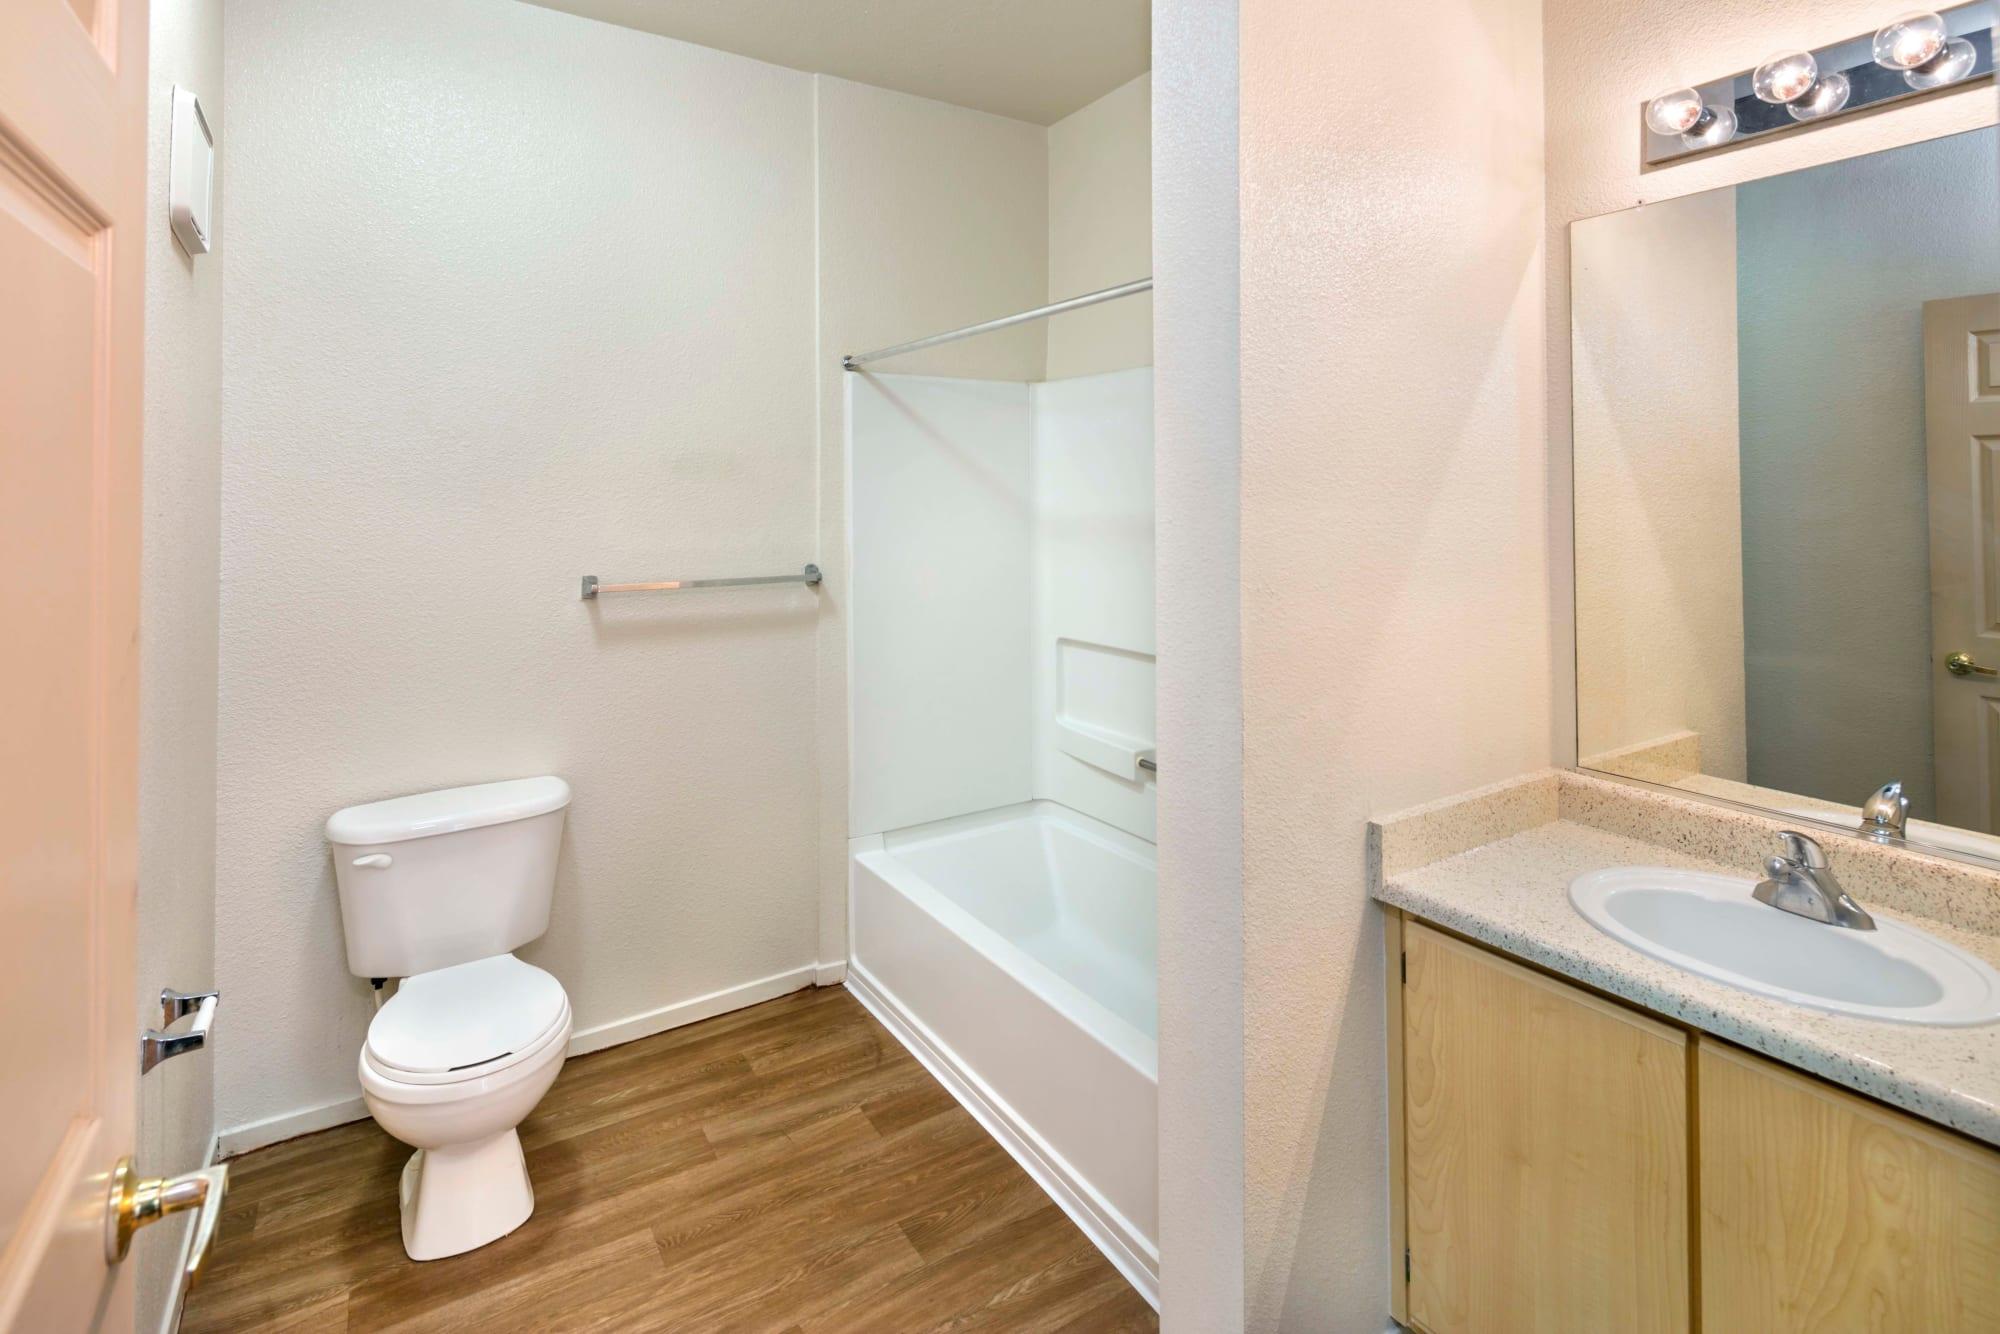 A bathroom layout at Natomas Park Apartments in Sacramento, California